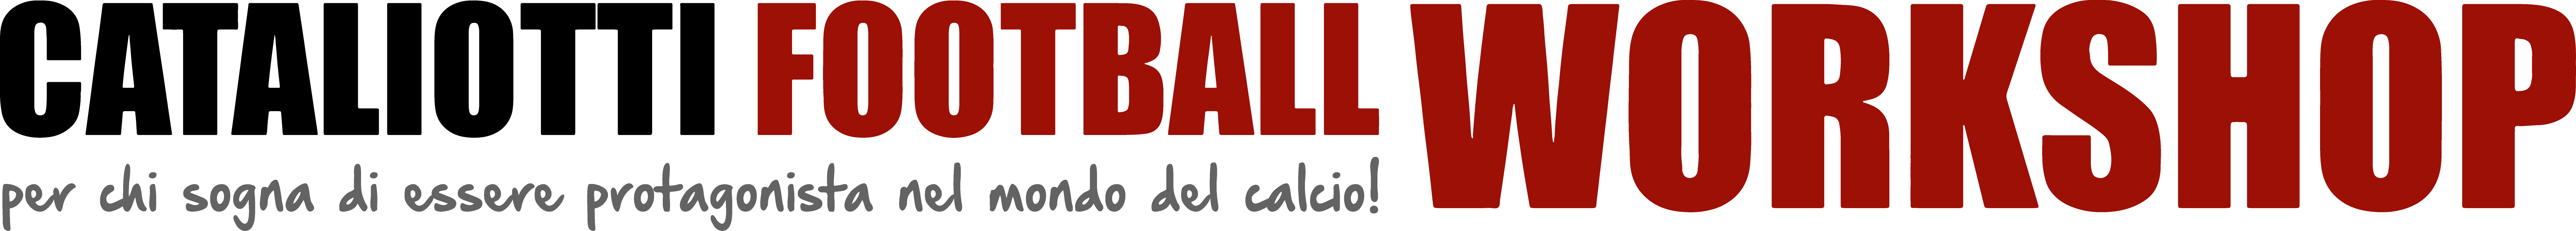 Testimonianze - Cataliotti Football Workshop 533150382fb2